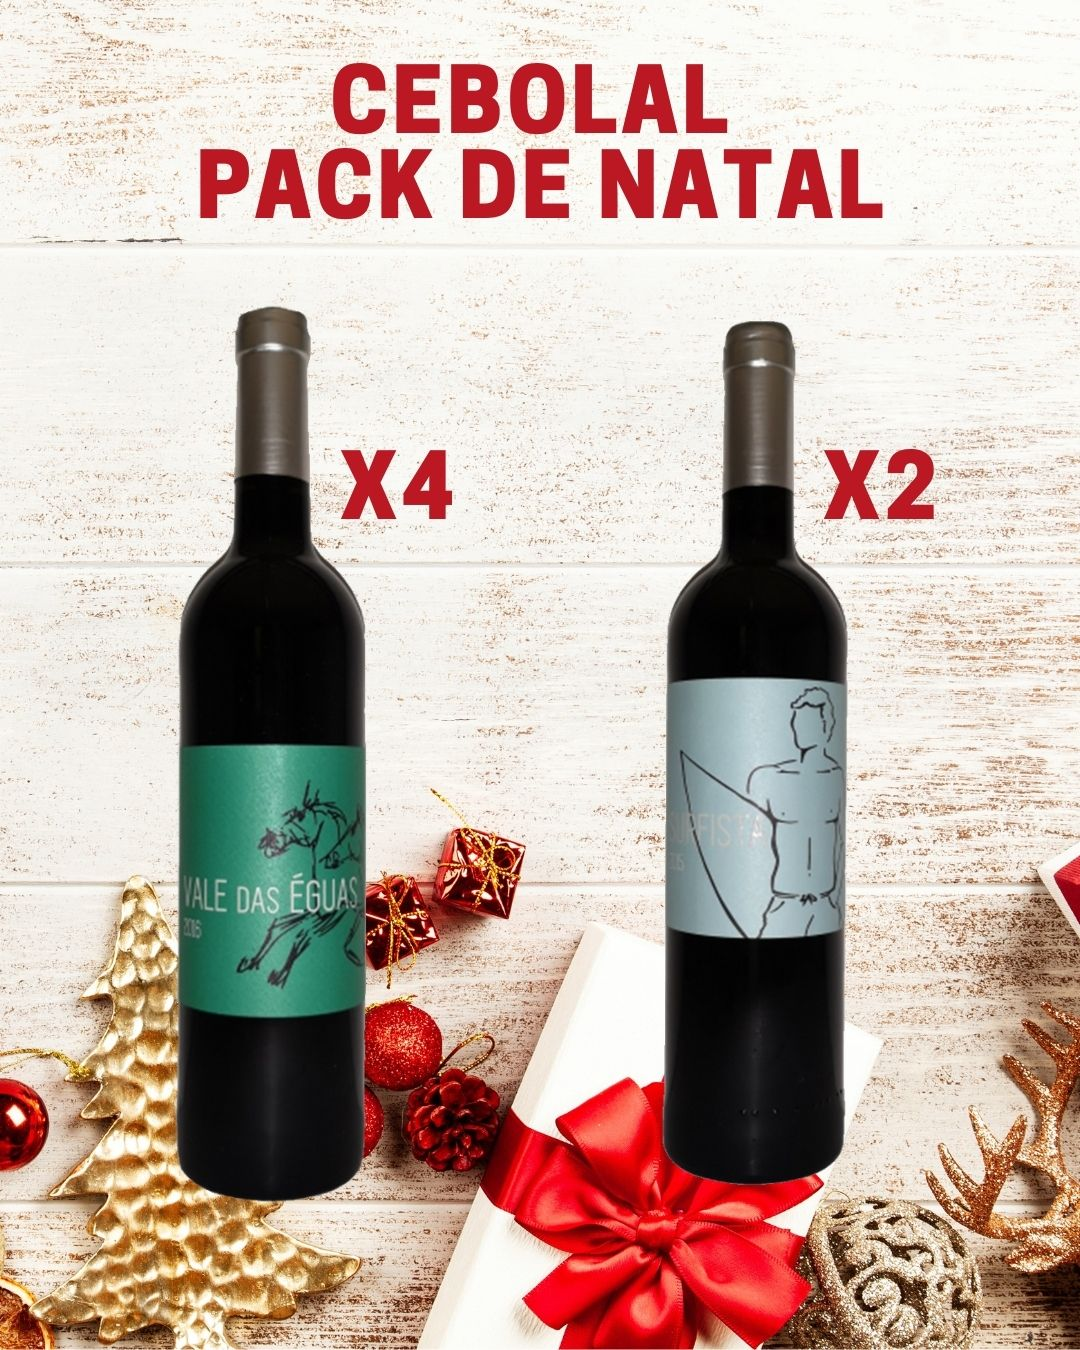 Cebolal Pack de Natal